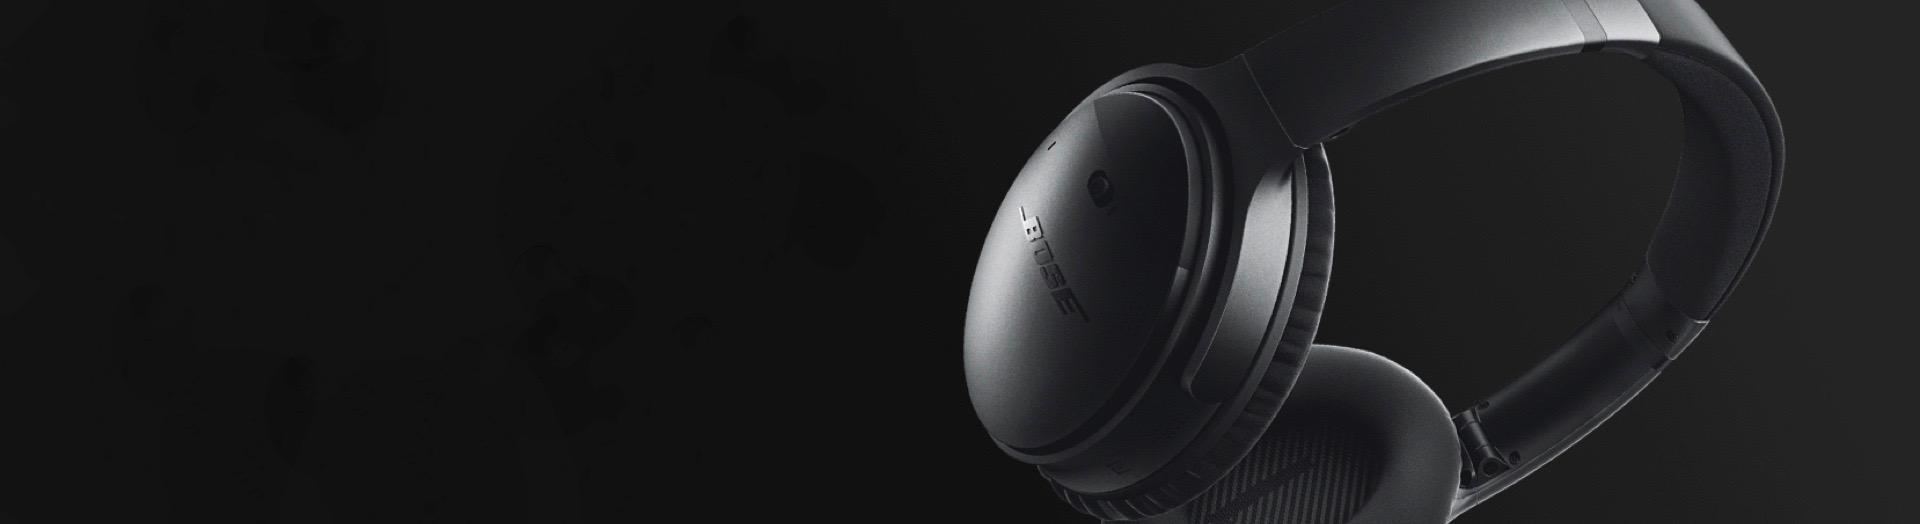 Bose hoofdtelefoons